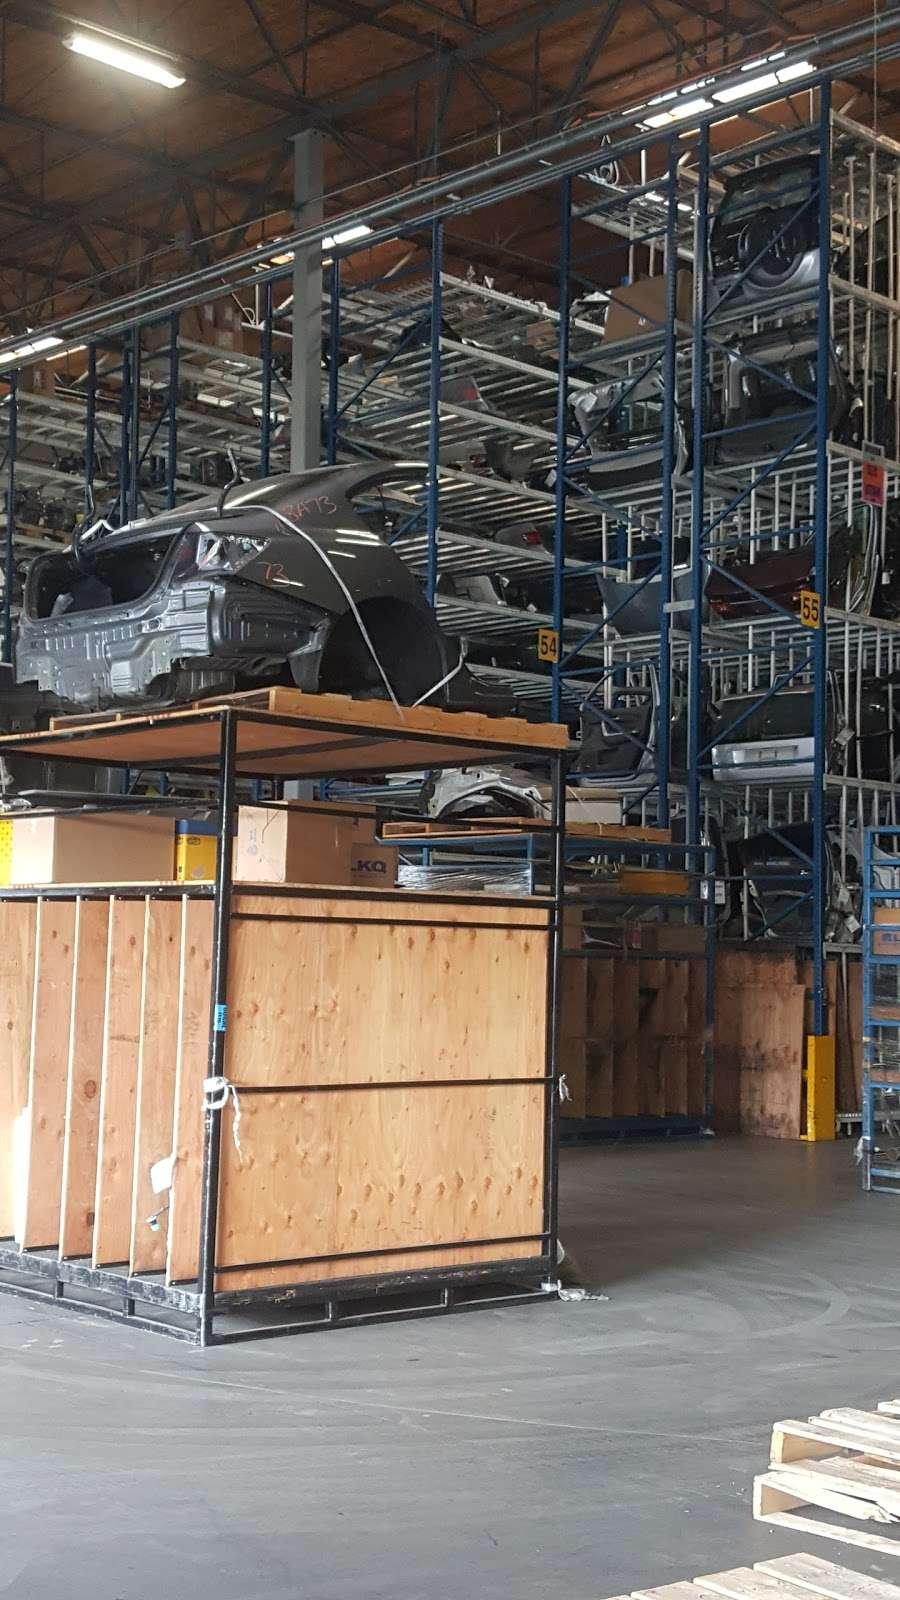 Keystone Automotive - Los Angeles - car repair  | Photo 6 of 10 | Address: 13642 Orden Dr, Santa Fe Springs, CA 90670, USA | Phone: (800) 243-4340